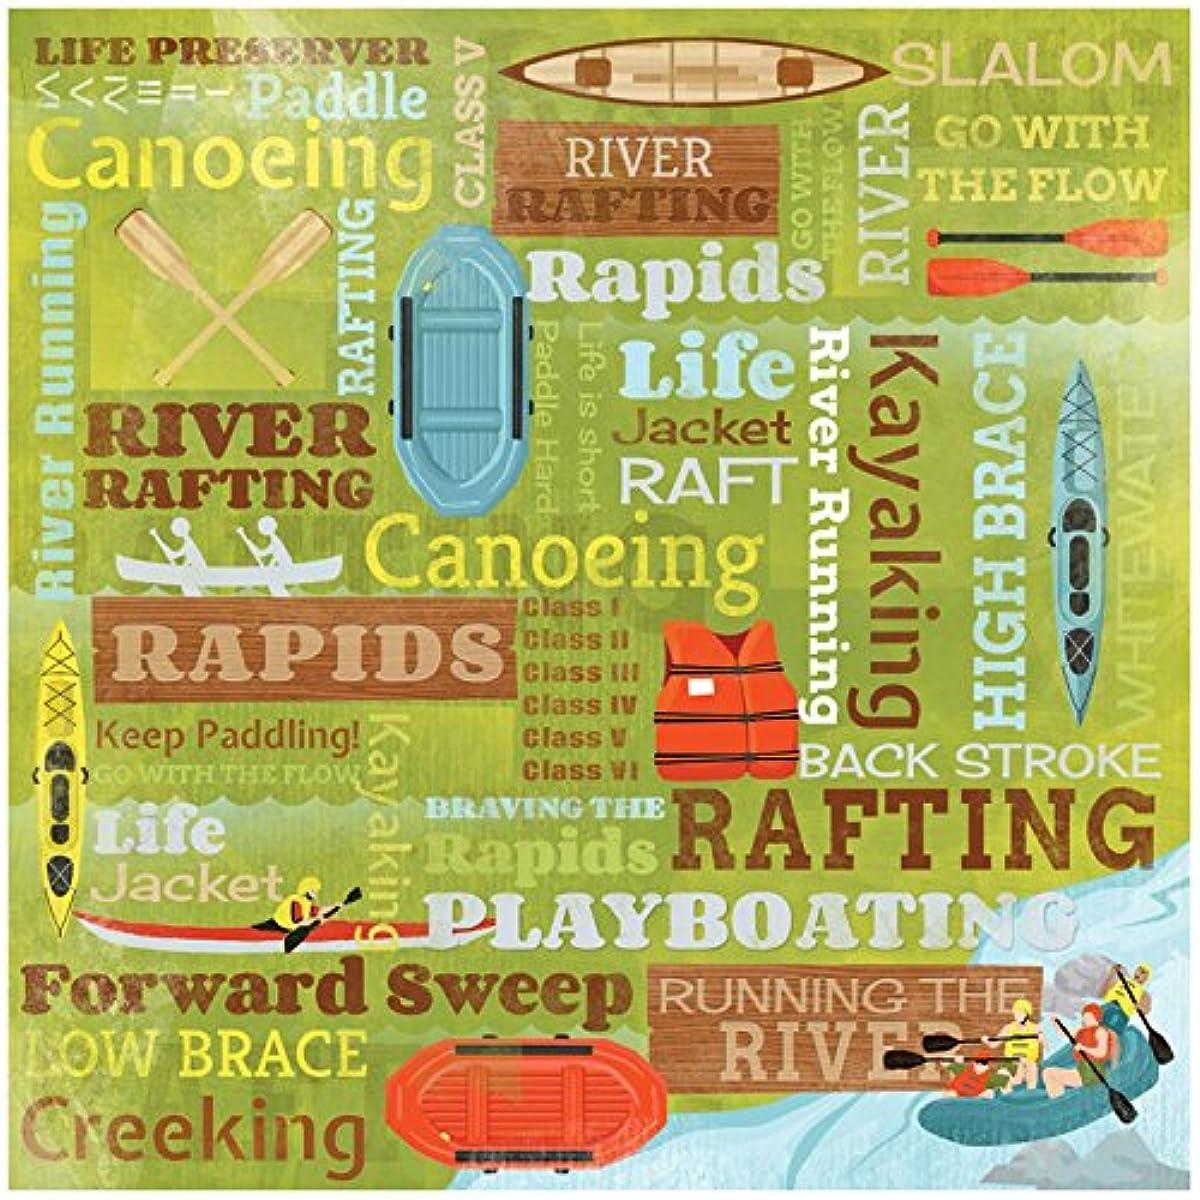 KAREN FOSTER Design Scrapbooking Paper, 25 Sheets, River Running Collage, 12 x 12